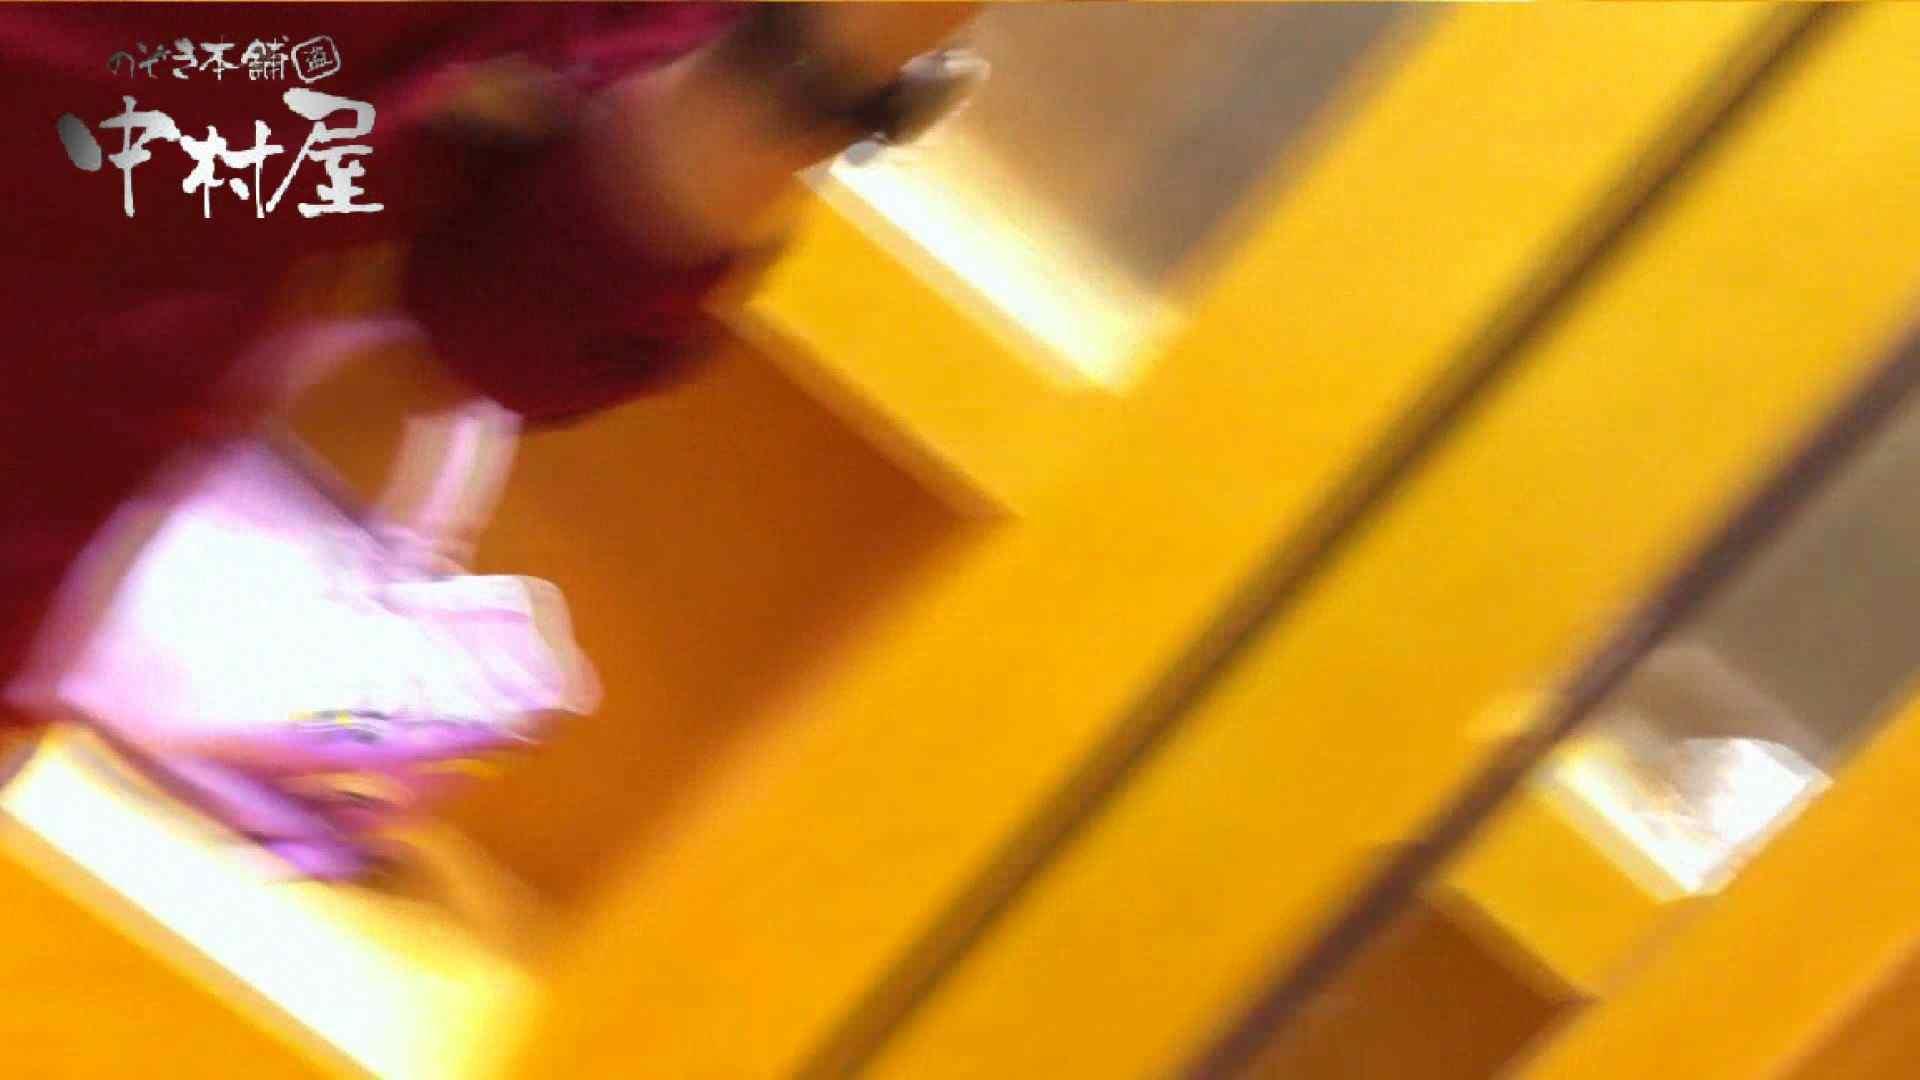 vol.48可愛いカリスマ店員胸チラ&パンチラ アニメ声の店員さん 胸チラ  96Pix 41